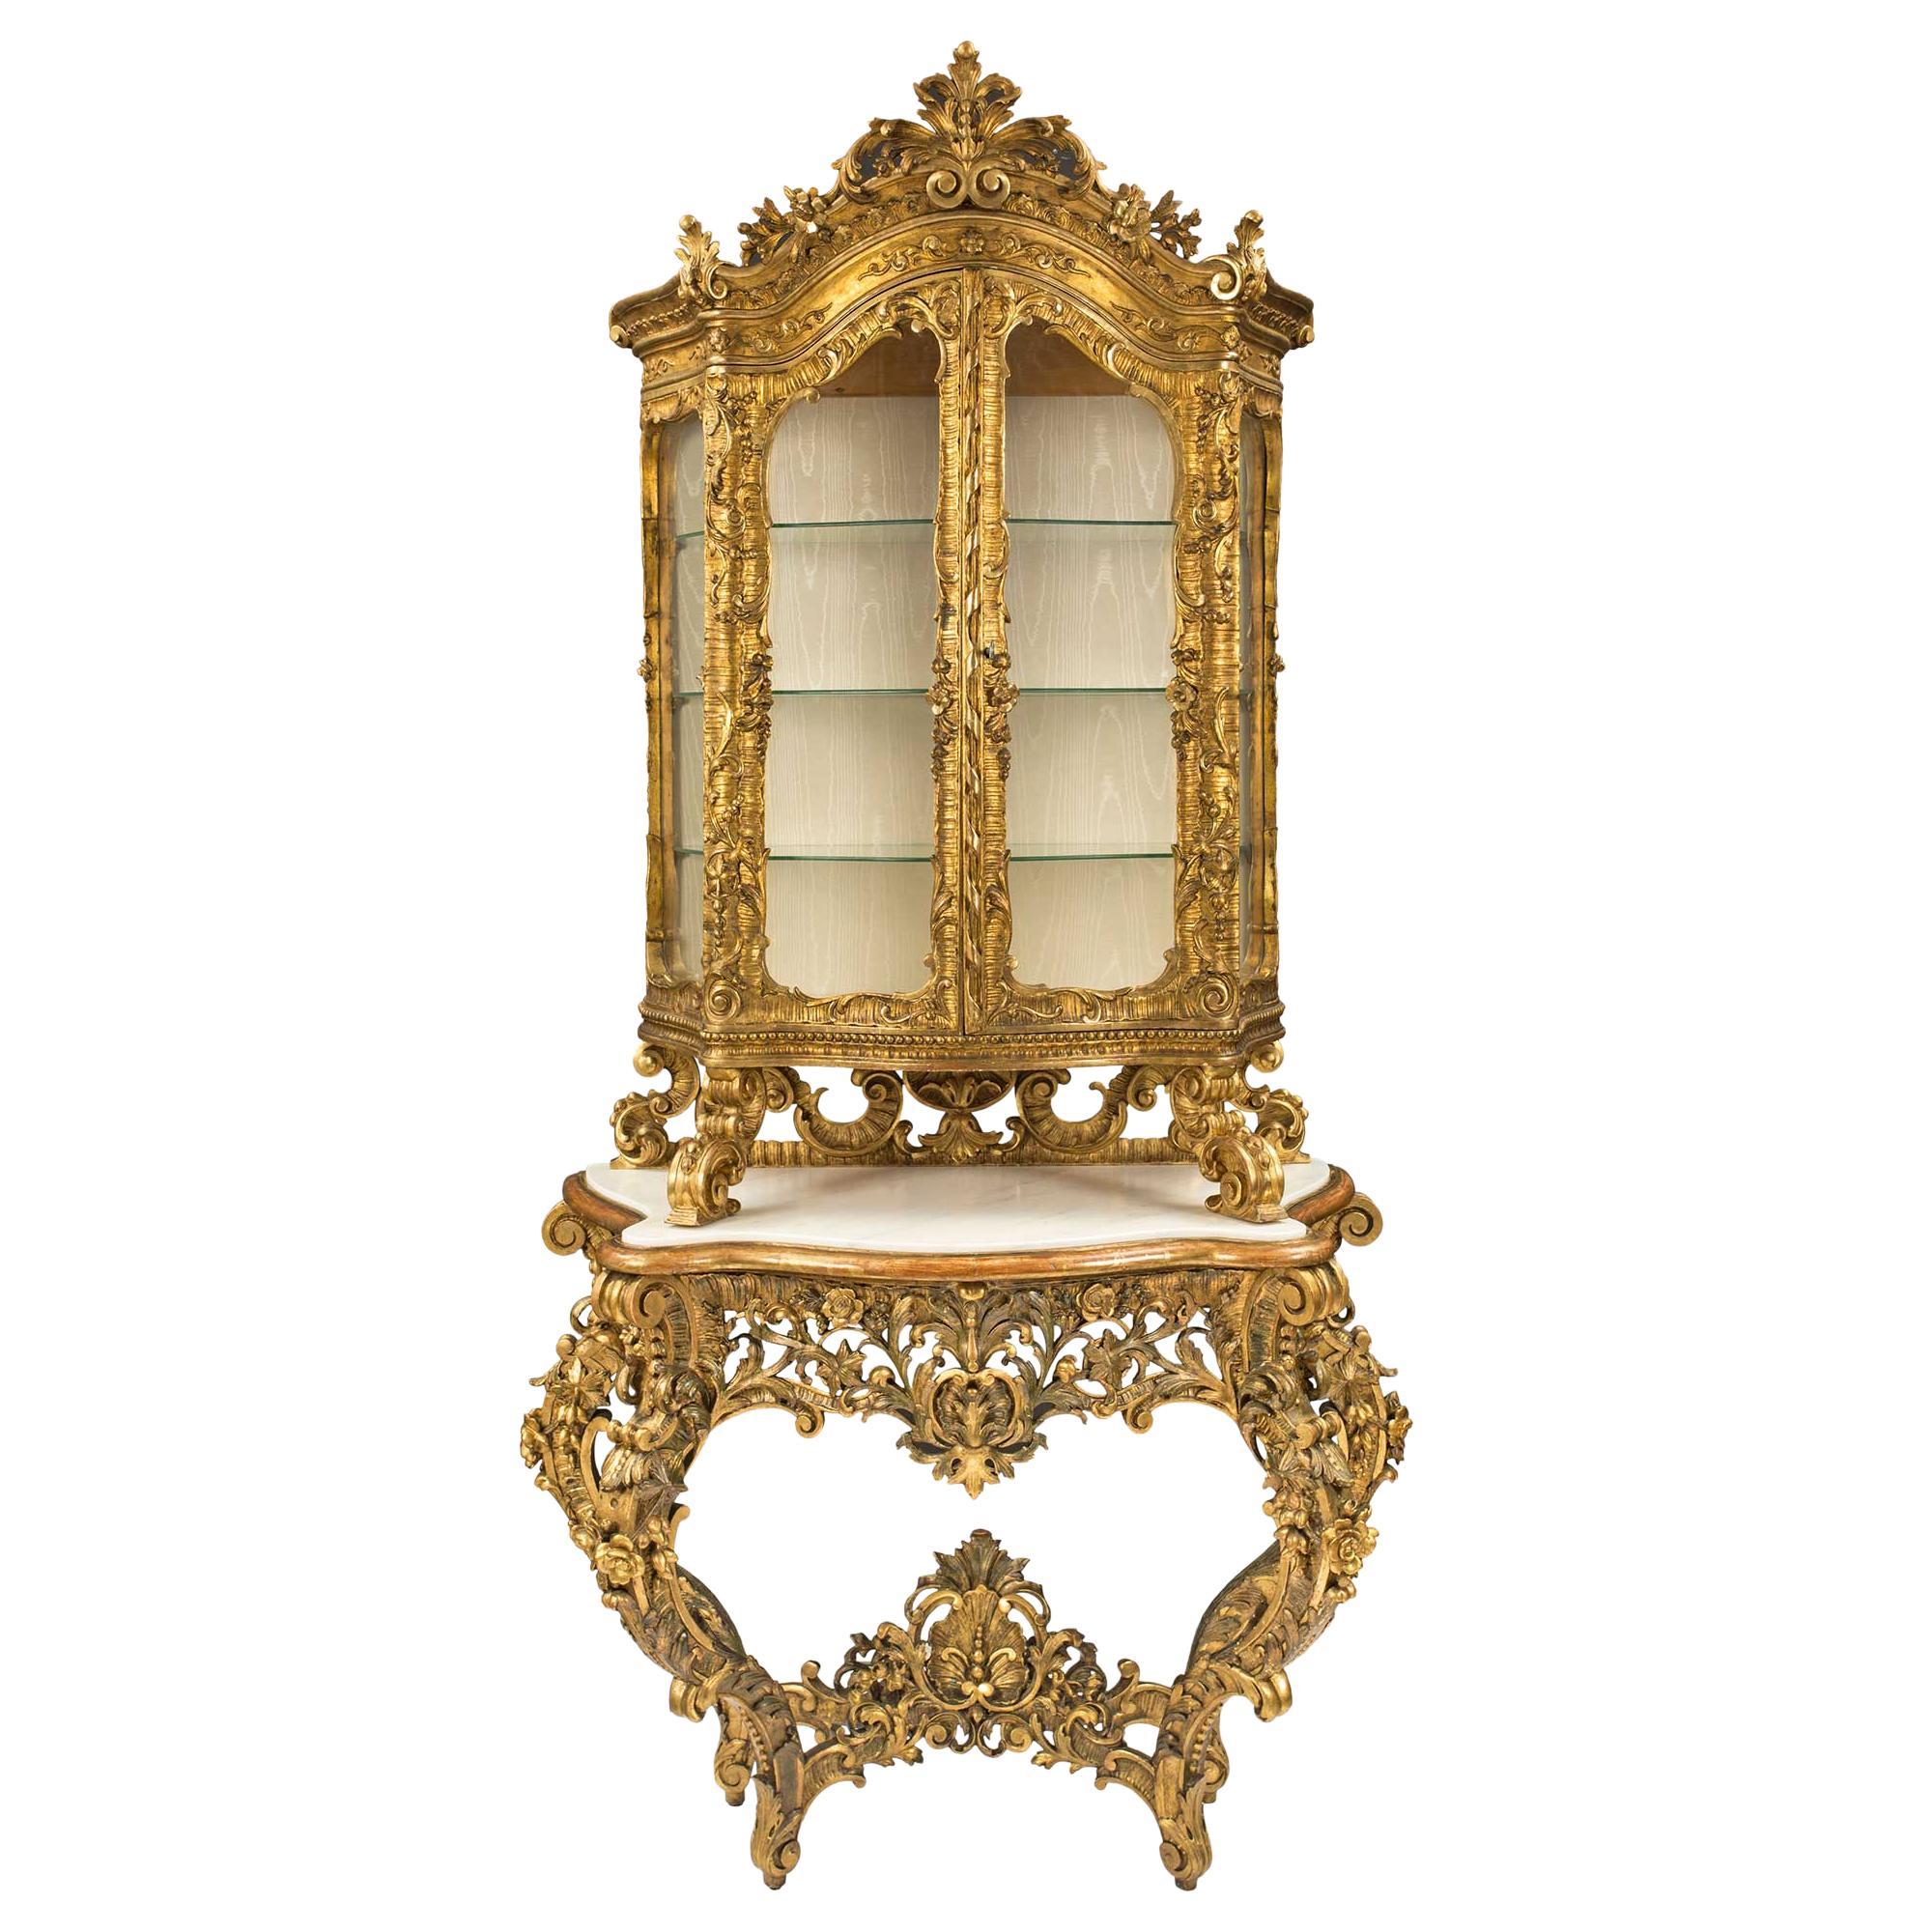 Italian 18th Century Giltwood, Polychrome and Marble Baroque Console Vitrine